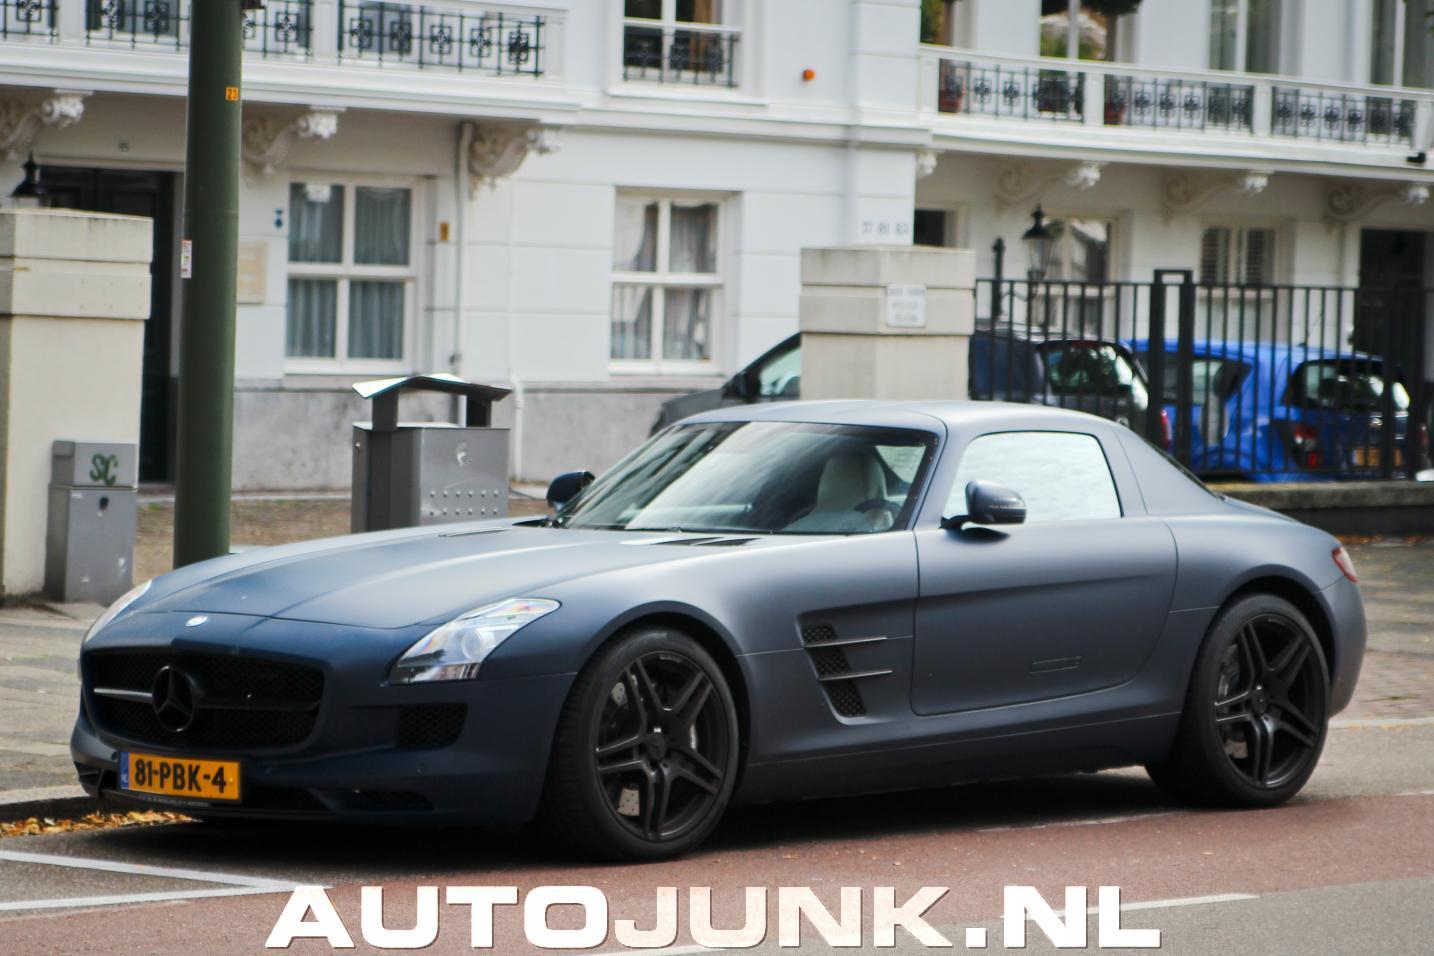 Mercedes benz sls coup 6 3 amg foto 39 s 148292 for 2015 mercedes benz sls amg coupe